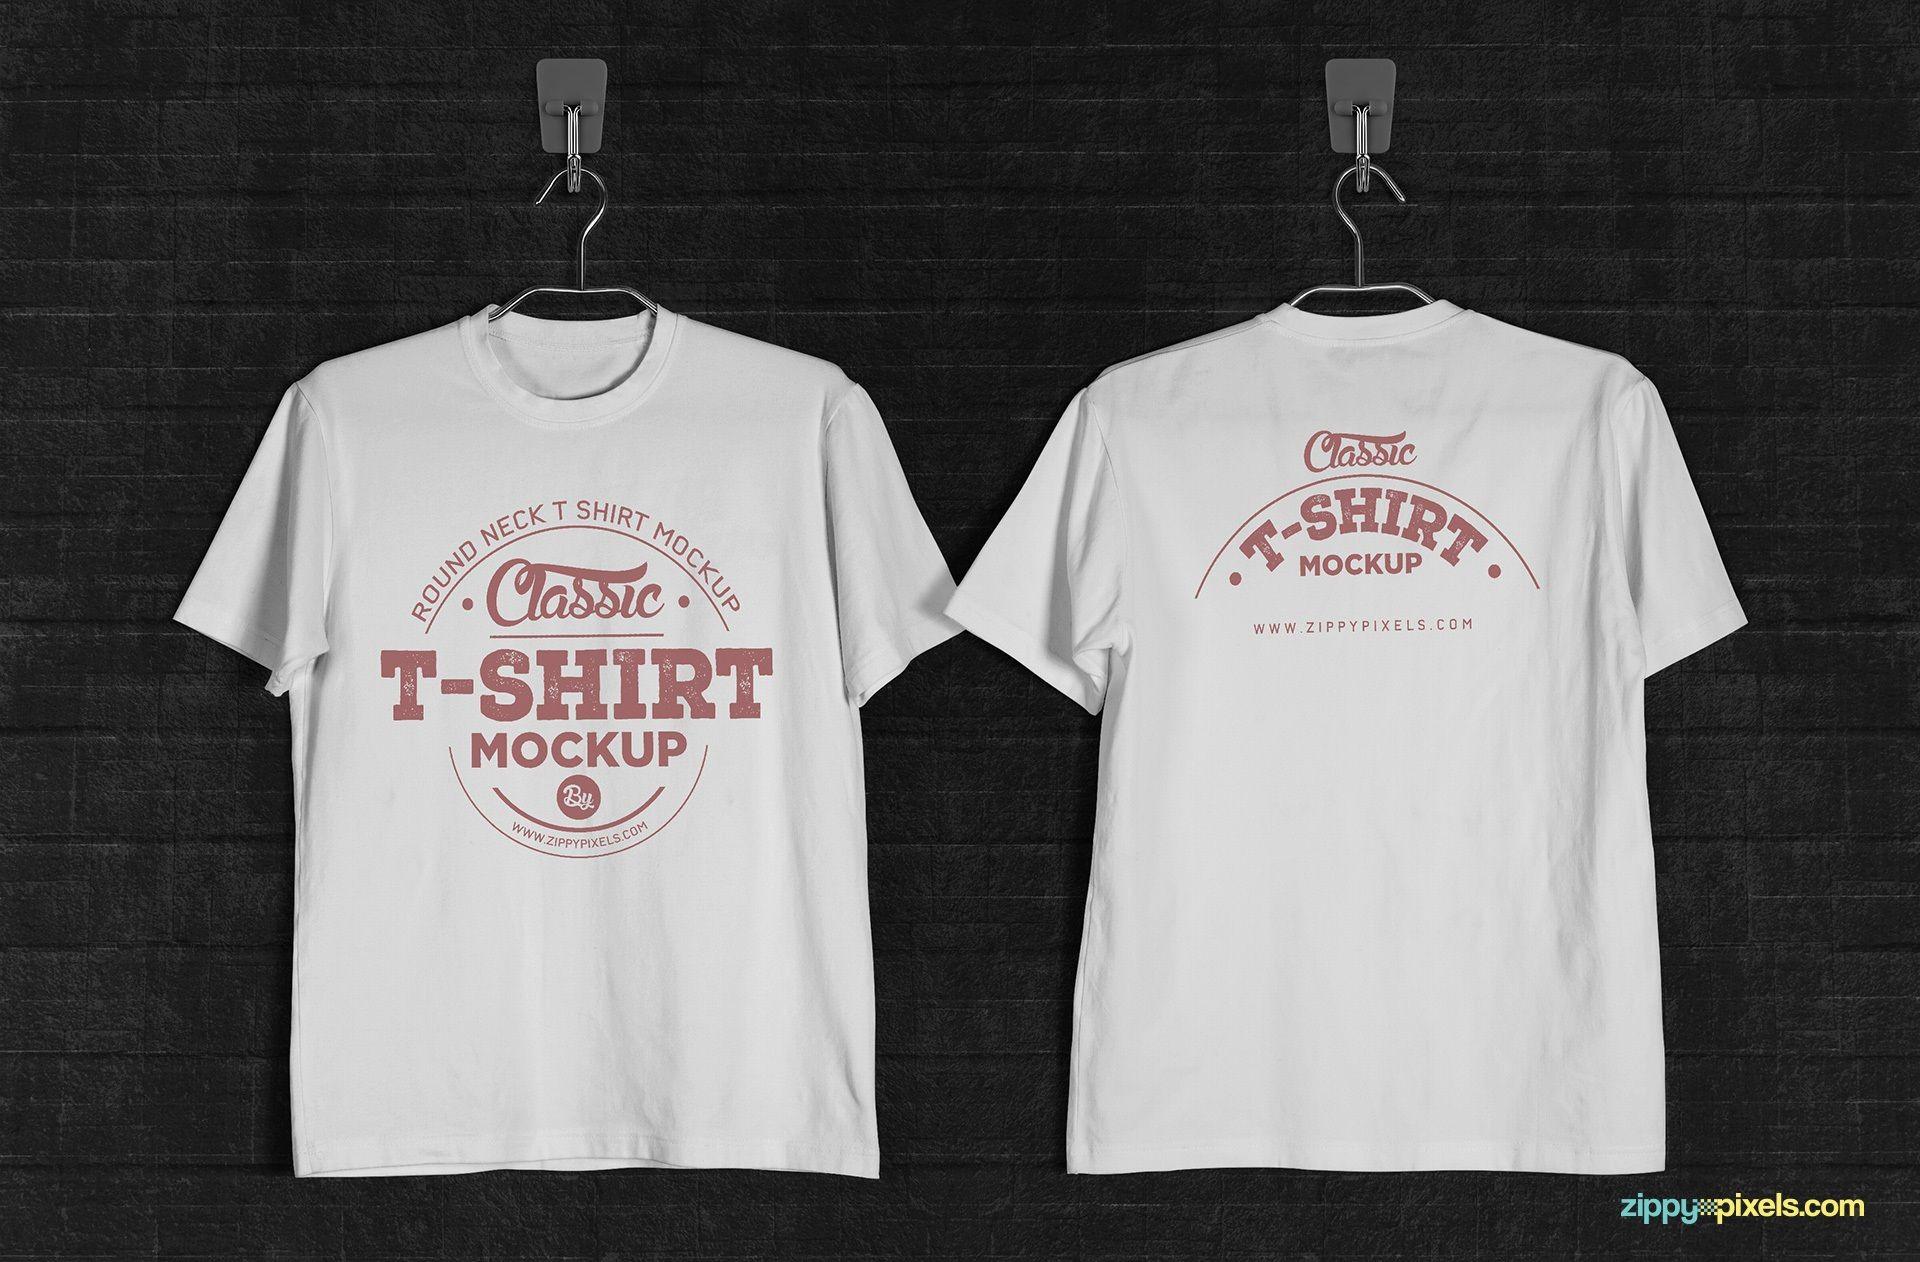 001 Unusual T Shirt Template Psd Idea  Design Mockup Free White Collar1920